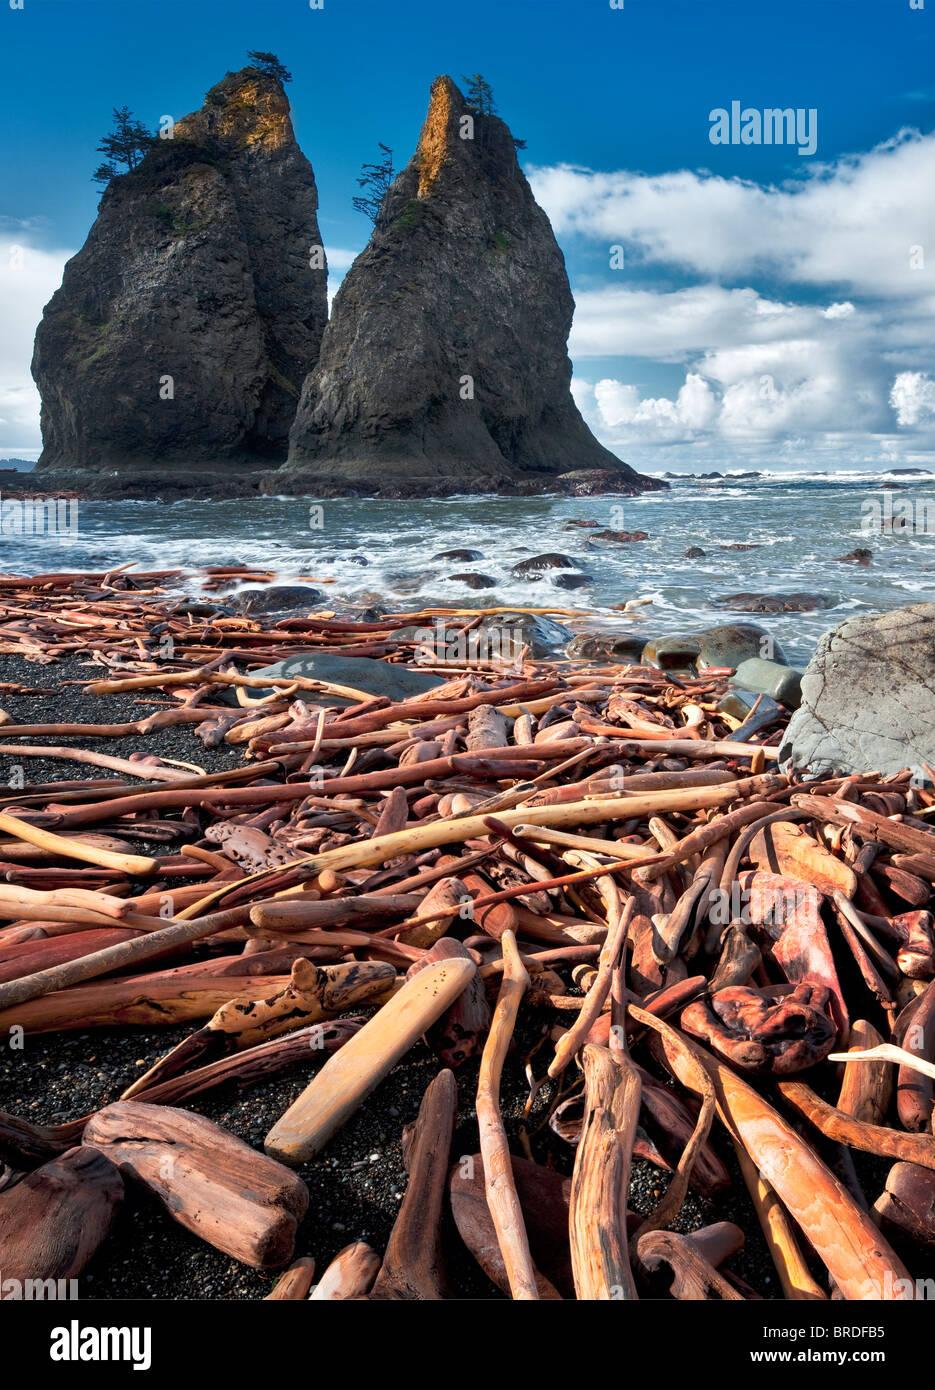 Seaside Rock Pool Stock Photos Seaside Rock Pool Stock Images Alamy